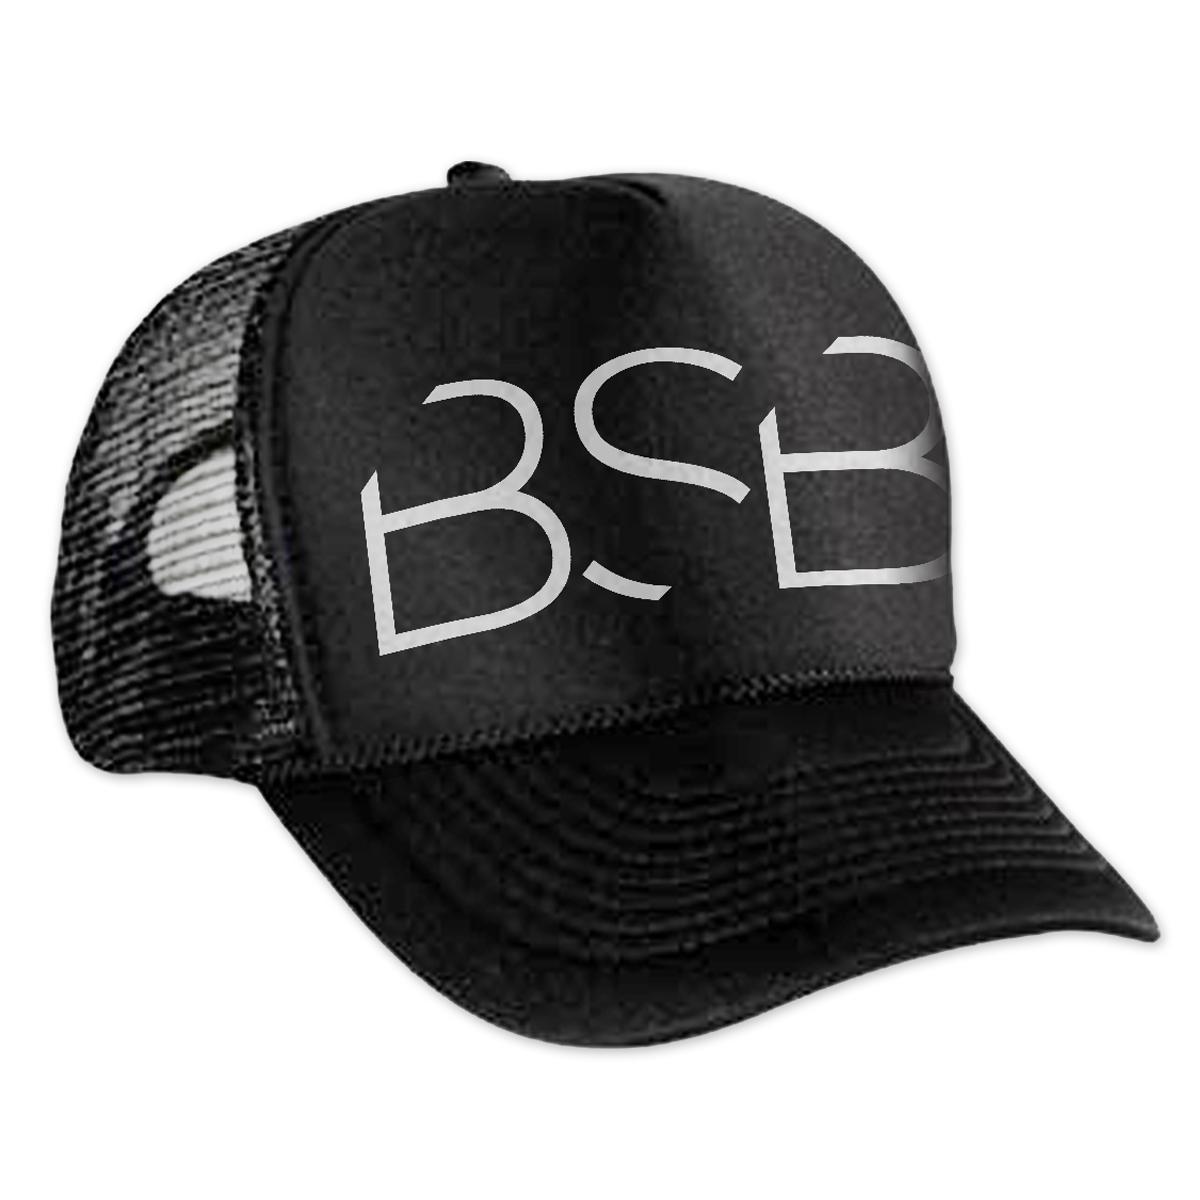 Backstreet Boys BSB Printed Trucker